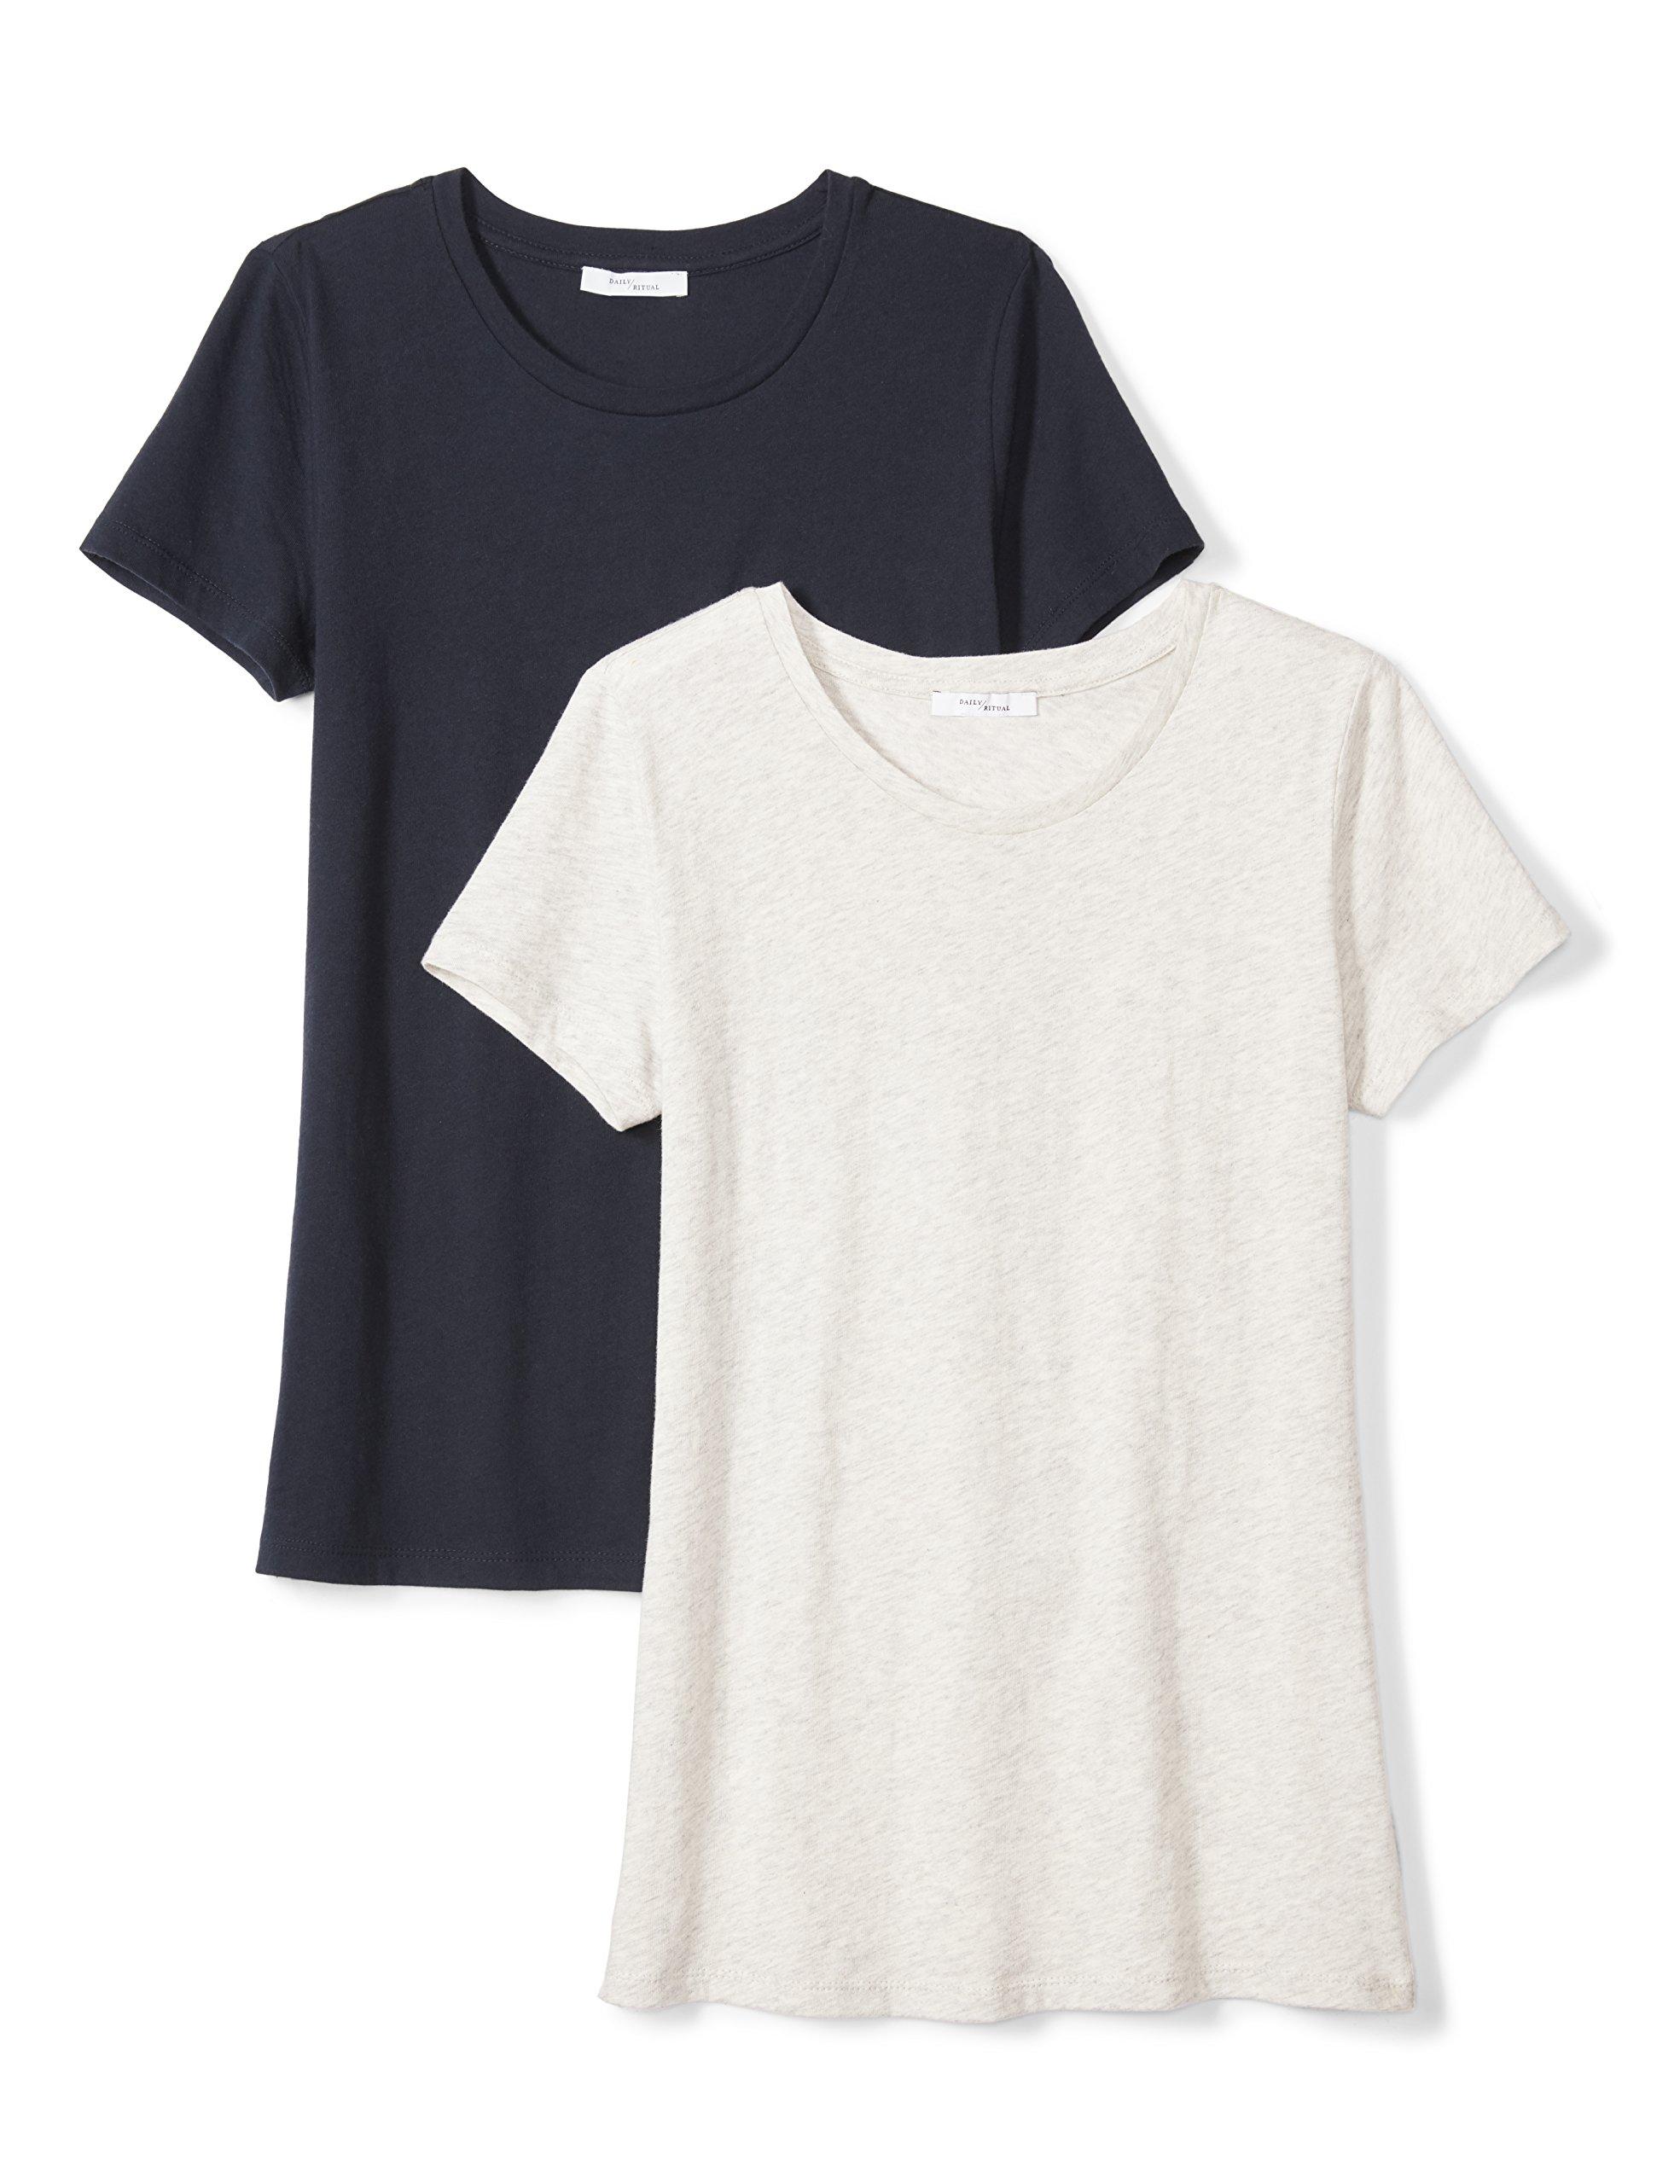 Amazon Brand - Daily Ritual Women's Featherweight Cotton Short-Sleeve Crew Neck T-Shirt